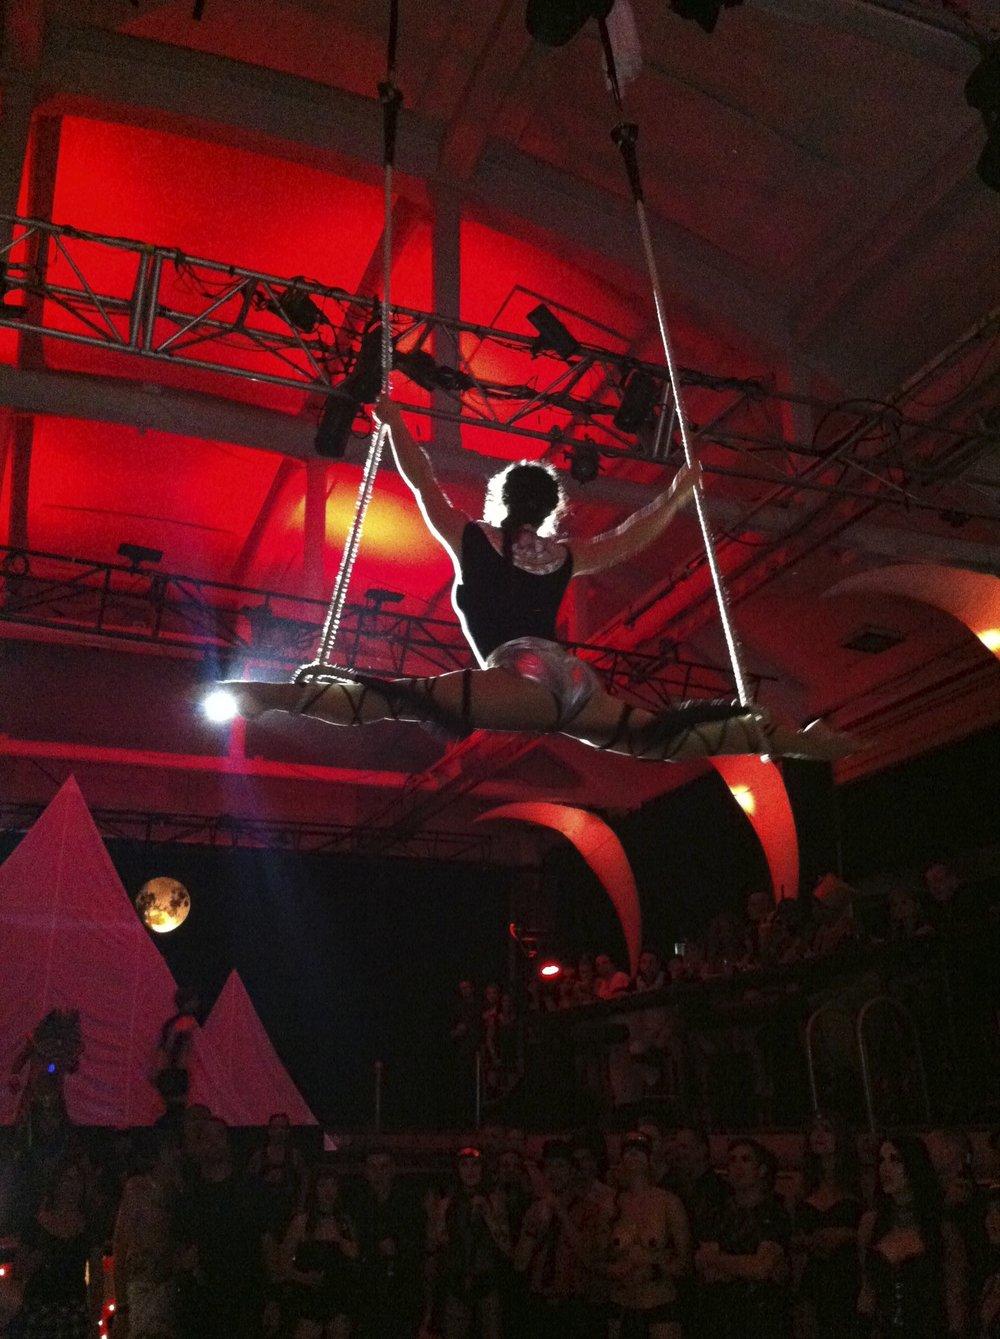 A Cirquantique performance at Bain Mathieu, 2014. Photograph by Sunita Nigam